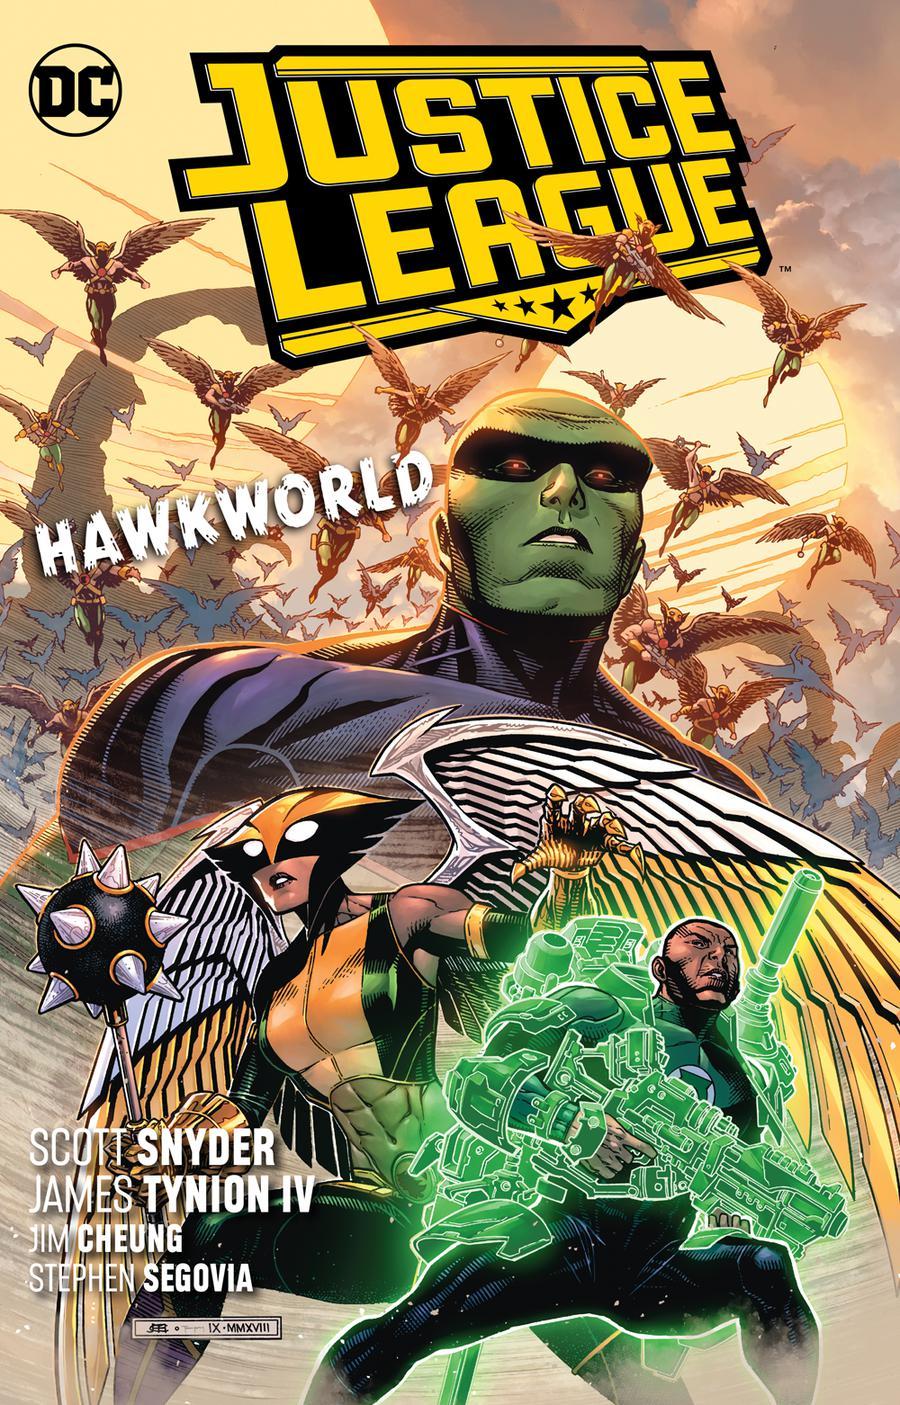 Justice League (2018) Vol 3 Hawkworld TP